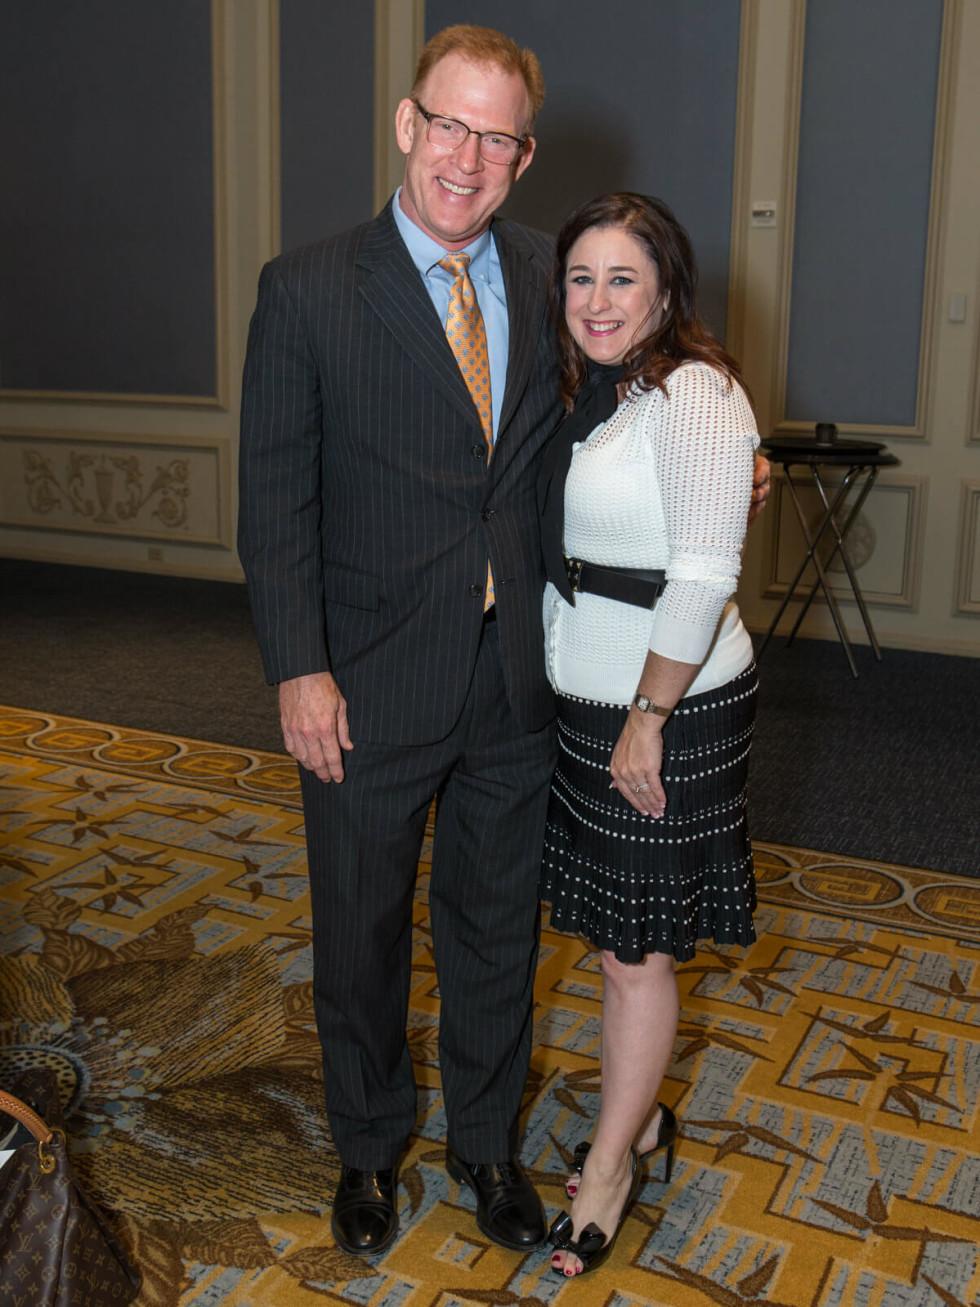 Darren Wickham and Junior League of Dallas Financial Vice President Melissa Wickham